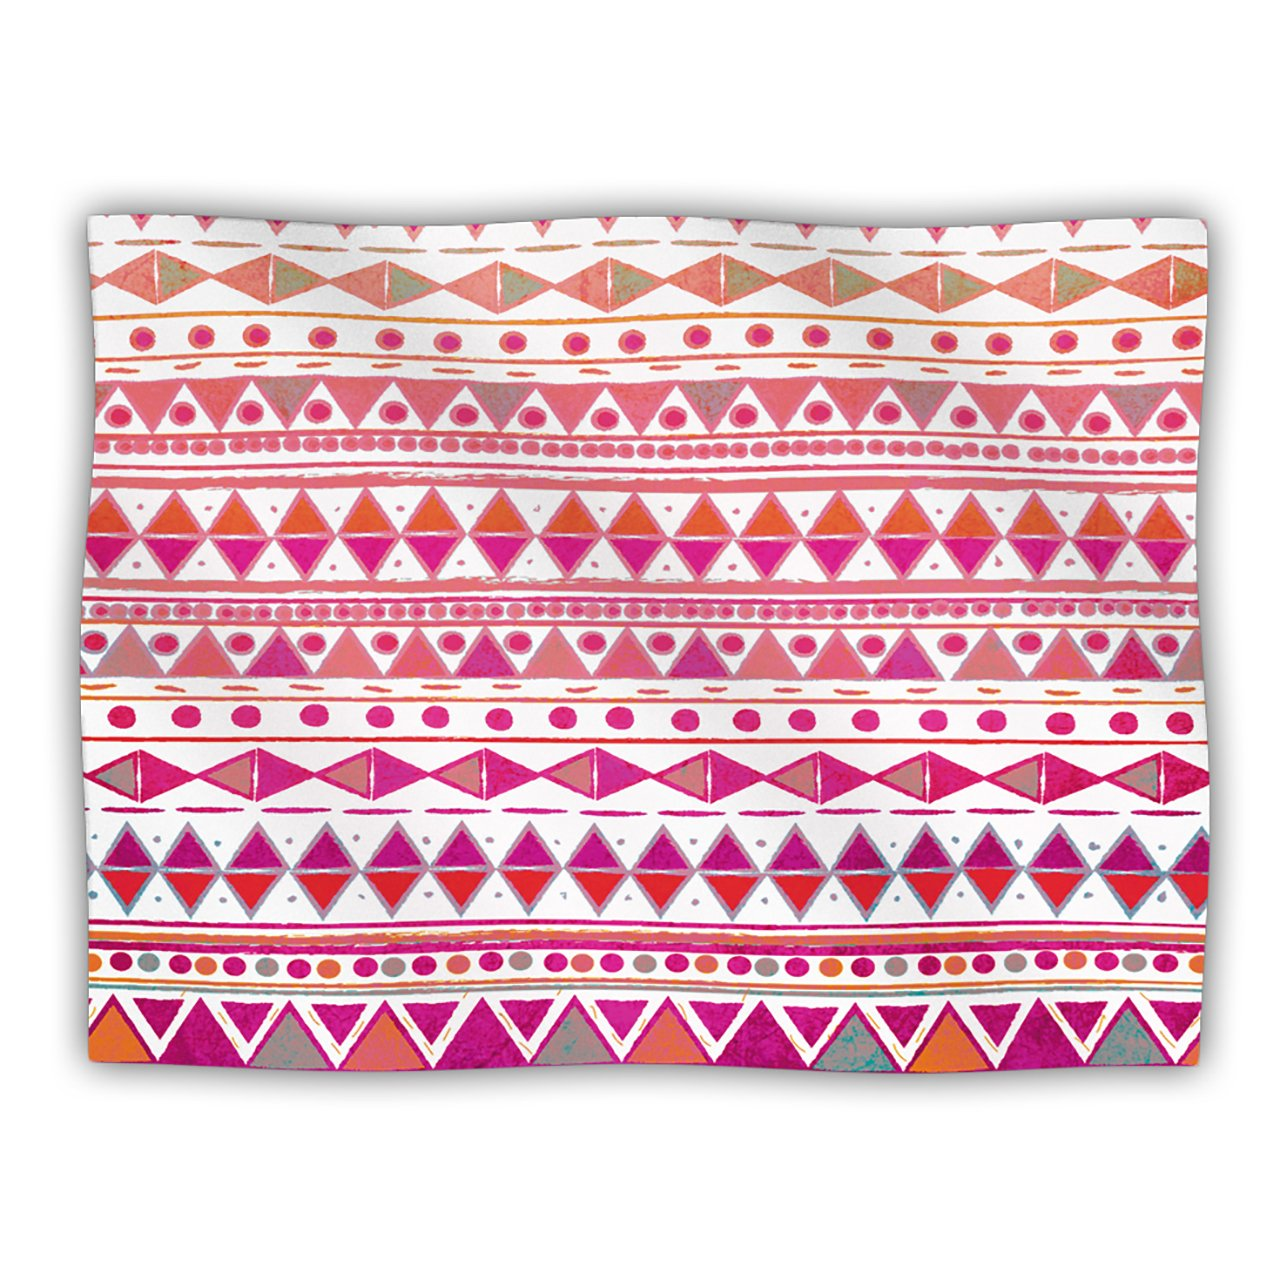 Kess InHouse Nika Martinez 'Summer Breeze' Dog Blanket, 40 by 30-Inch